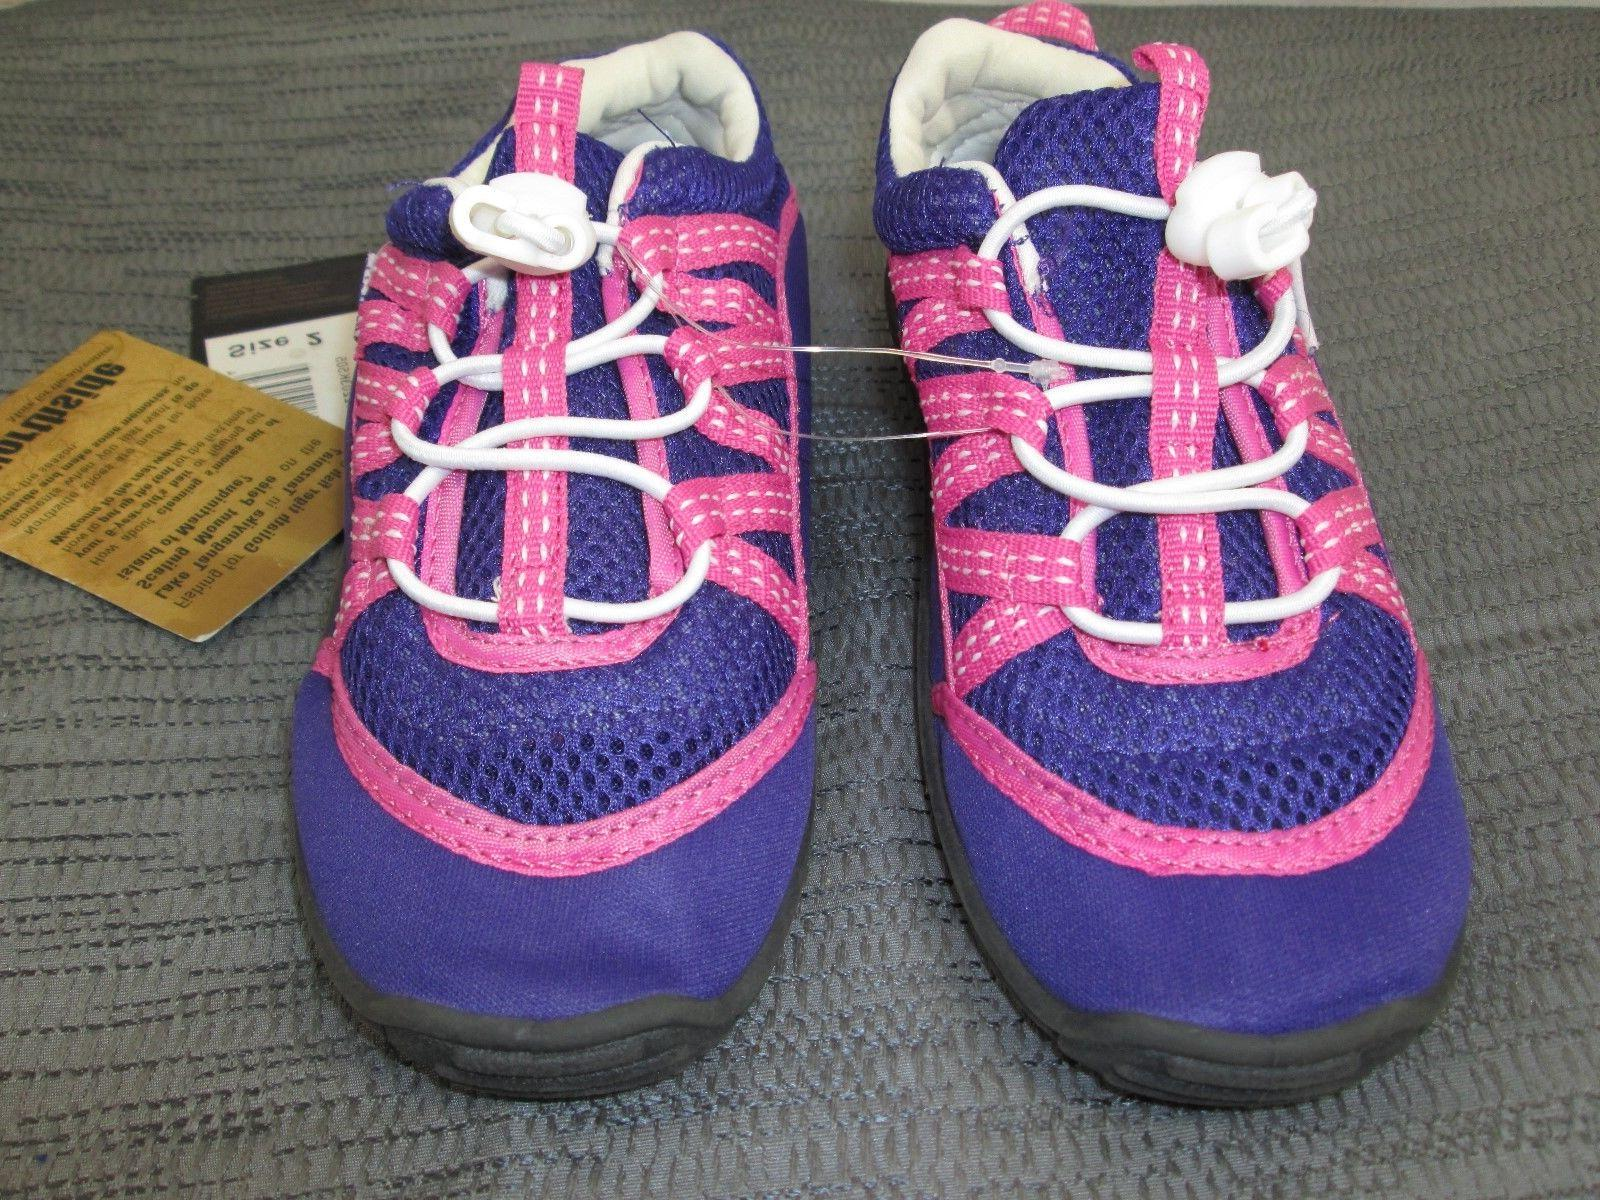 NEW Northside Water Girl's Size Purple Neoprene Sandals Shoes